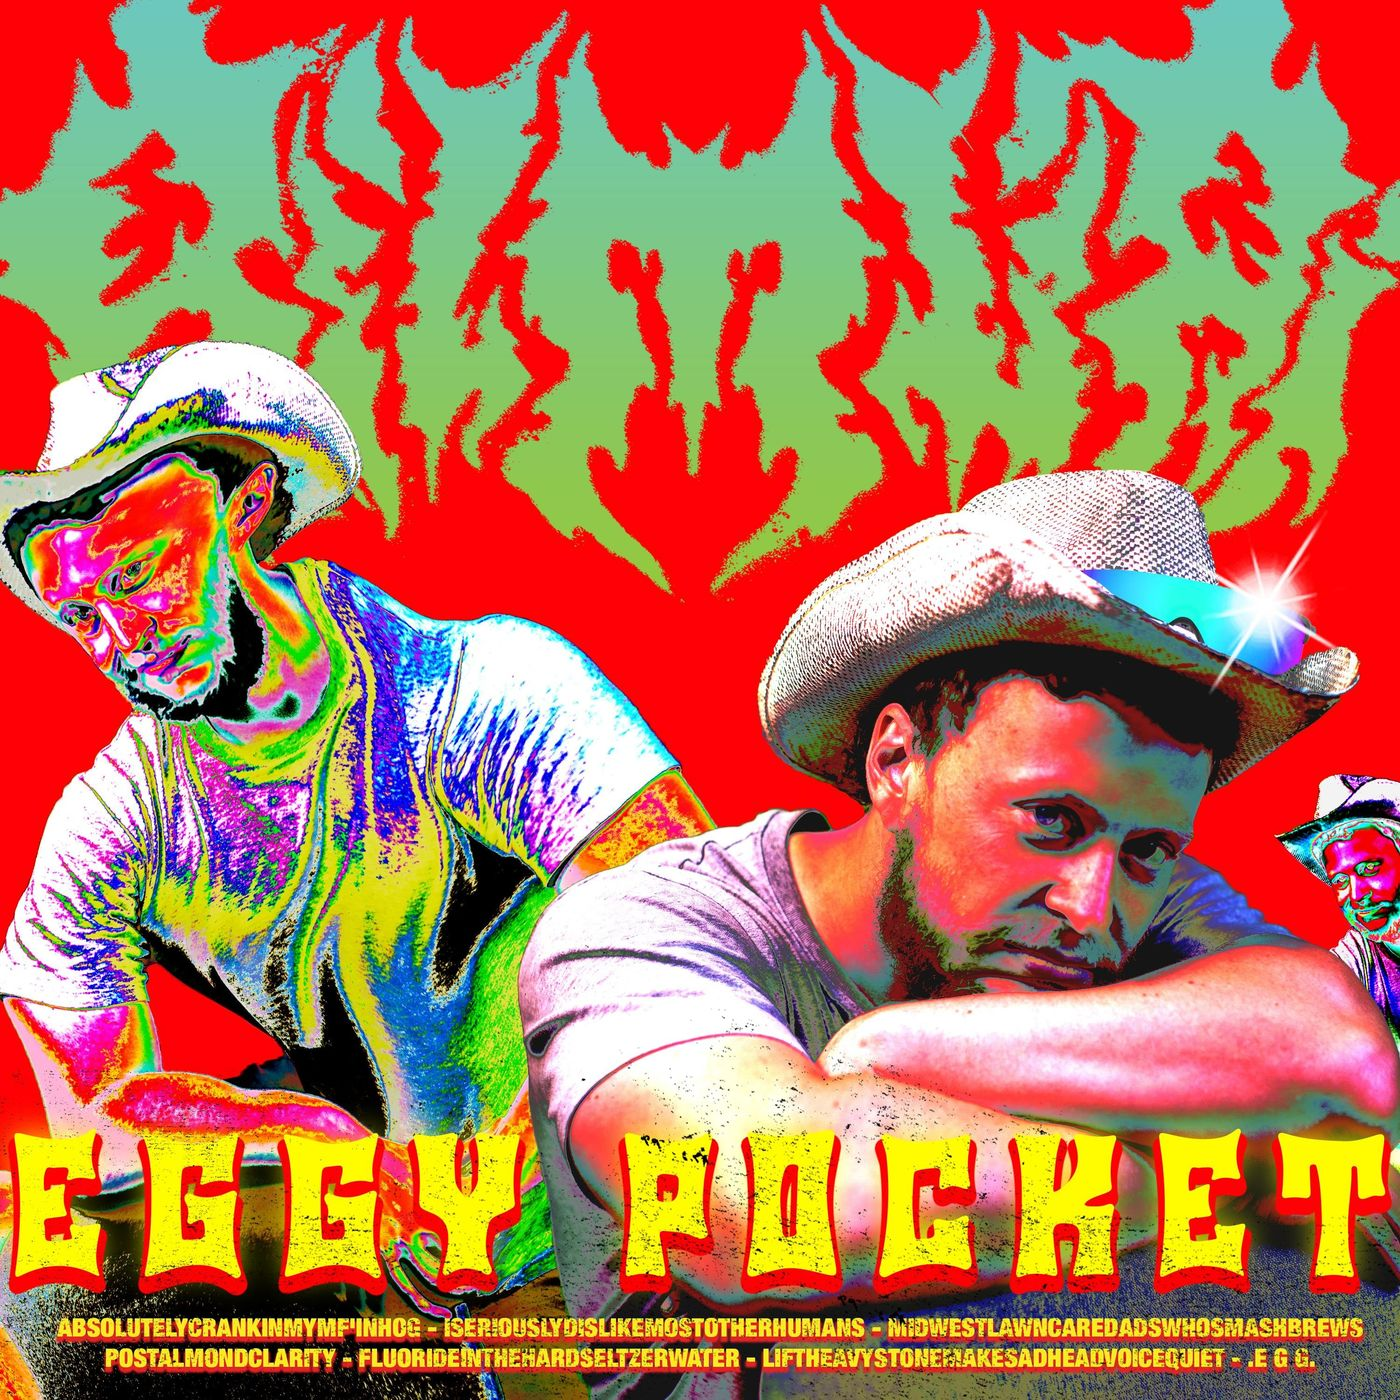 Bilmuri - EGGY POCKET [EP] (2020)